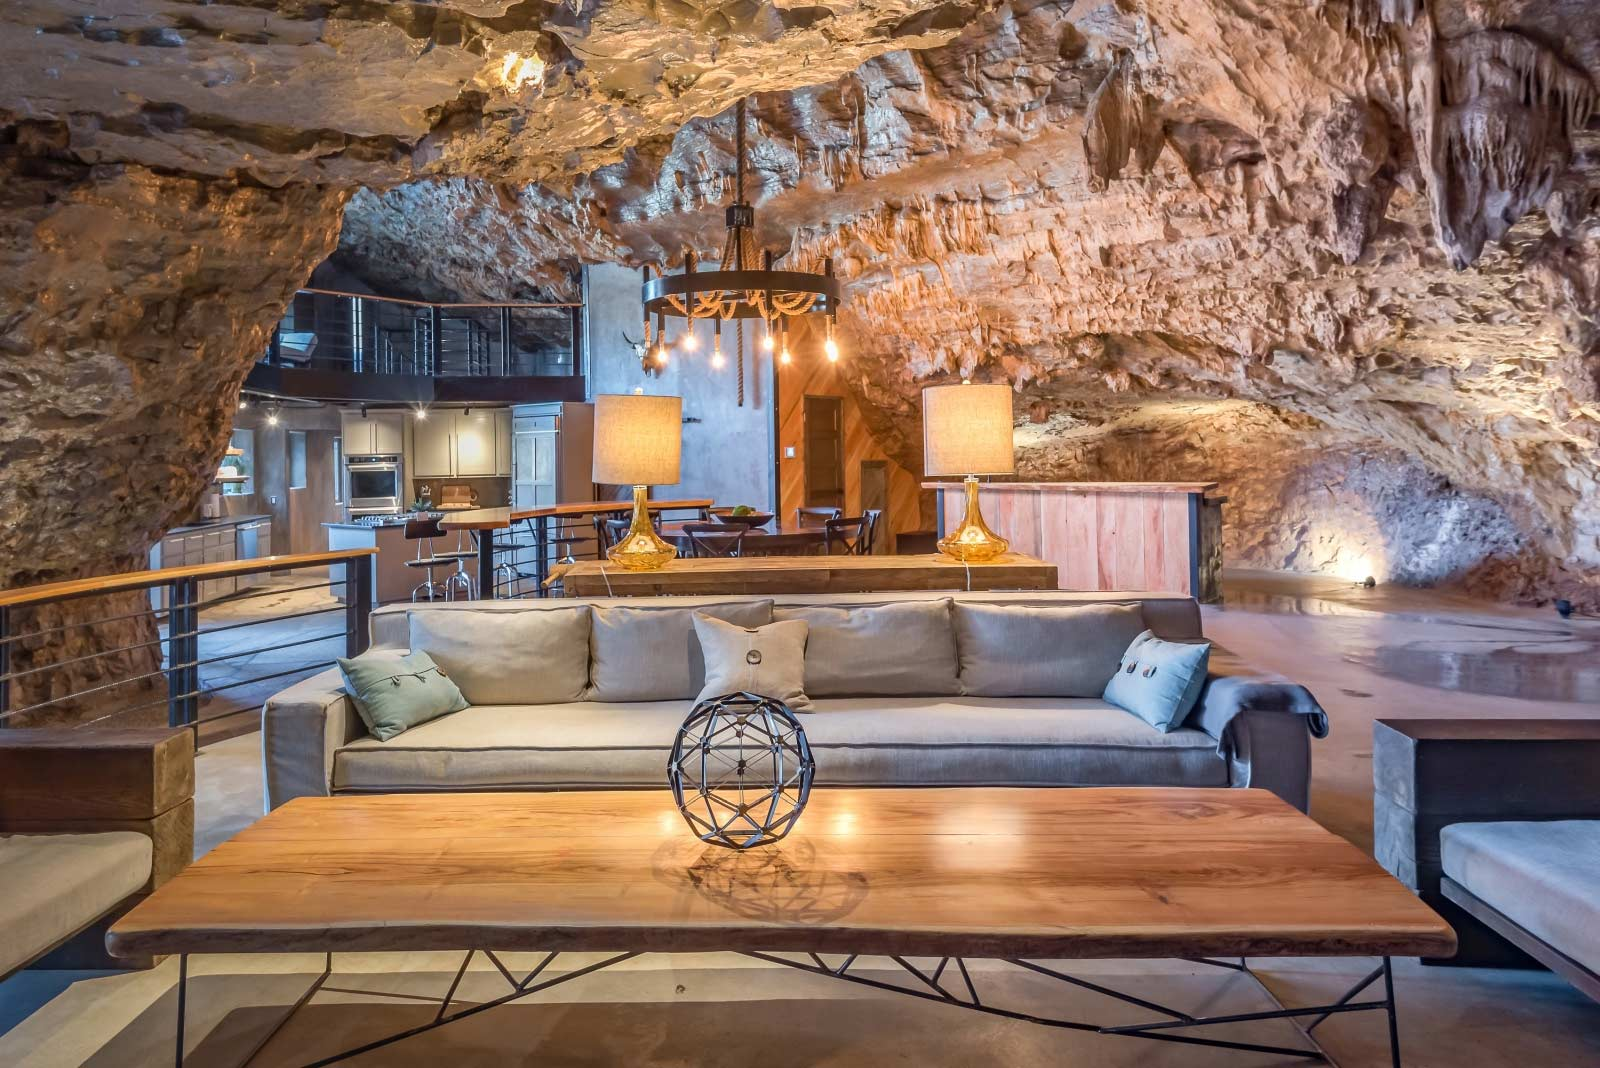 The Beckham Creek Cave Lodge The-Beckham-Creek-Cave-Lodge_02